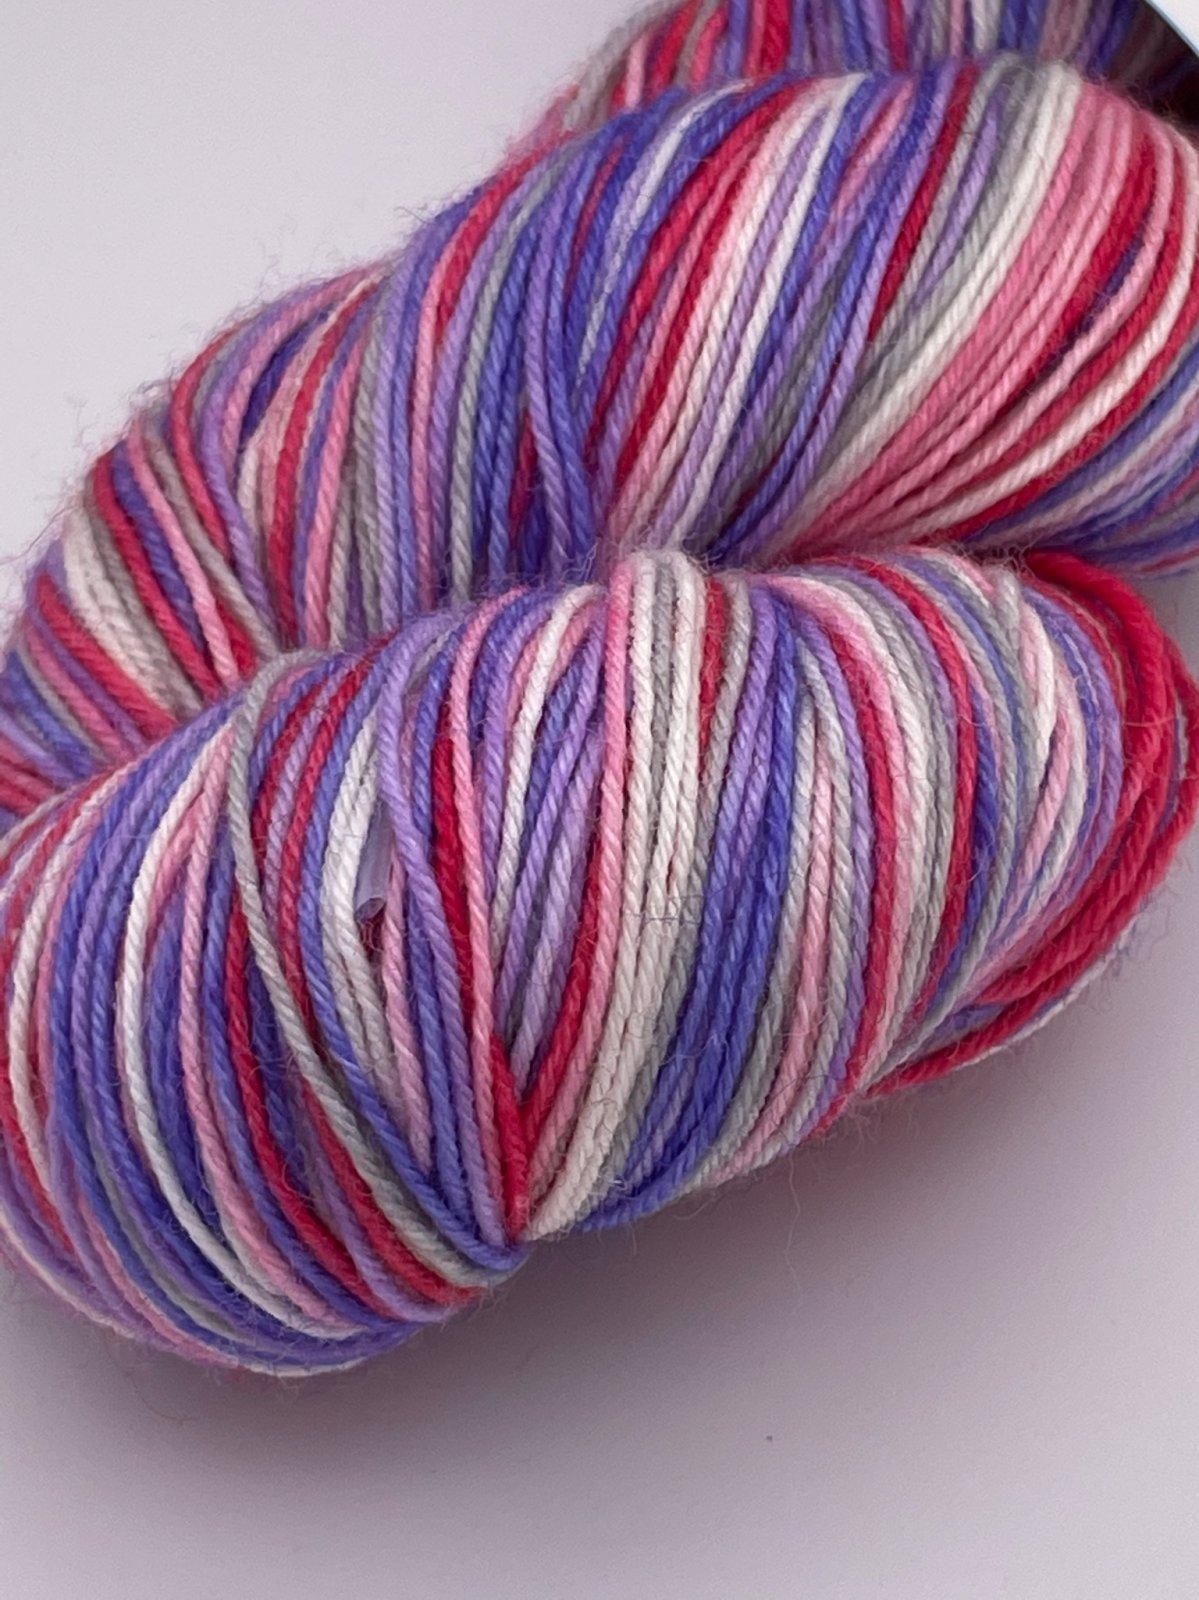 LunaPurl Self-Striping Sock